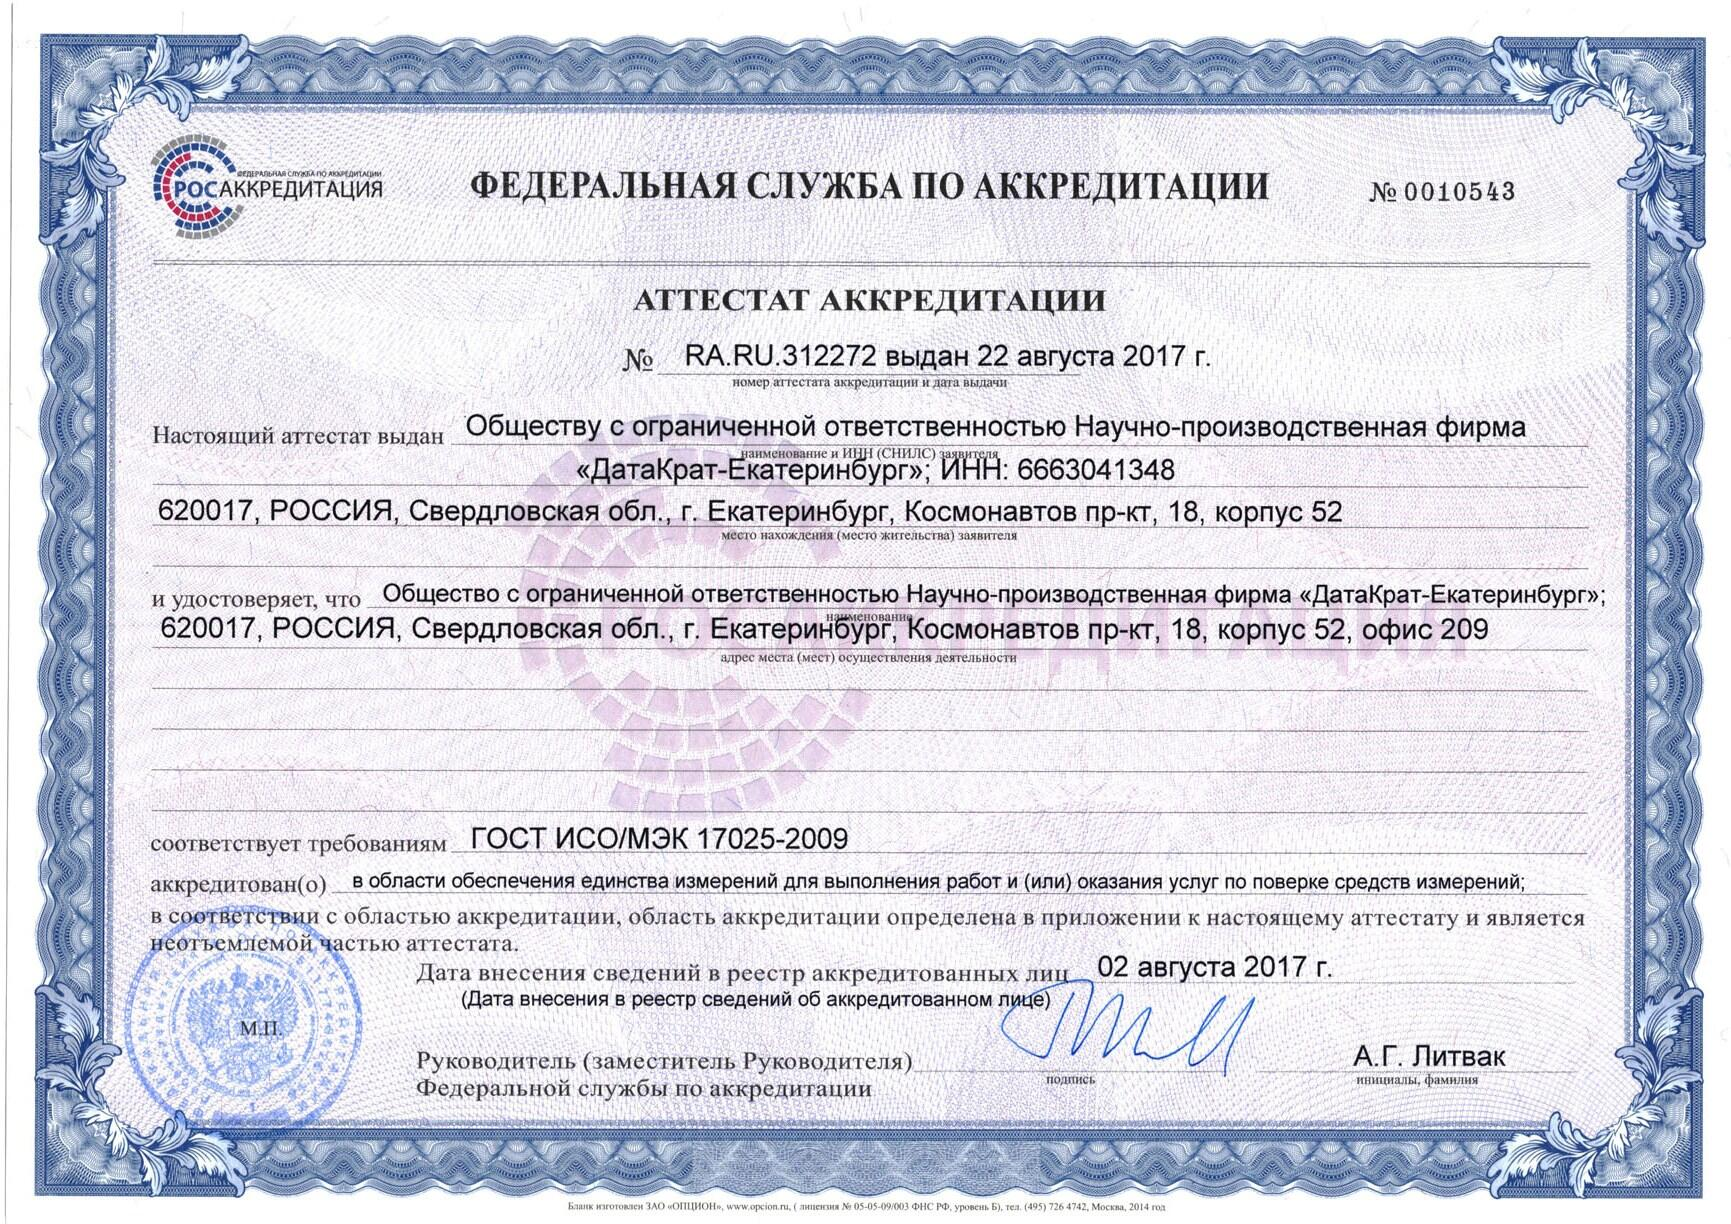 Пример аттестата аккредитации на поверку